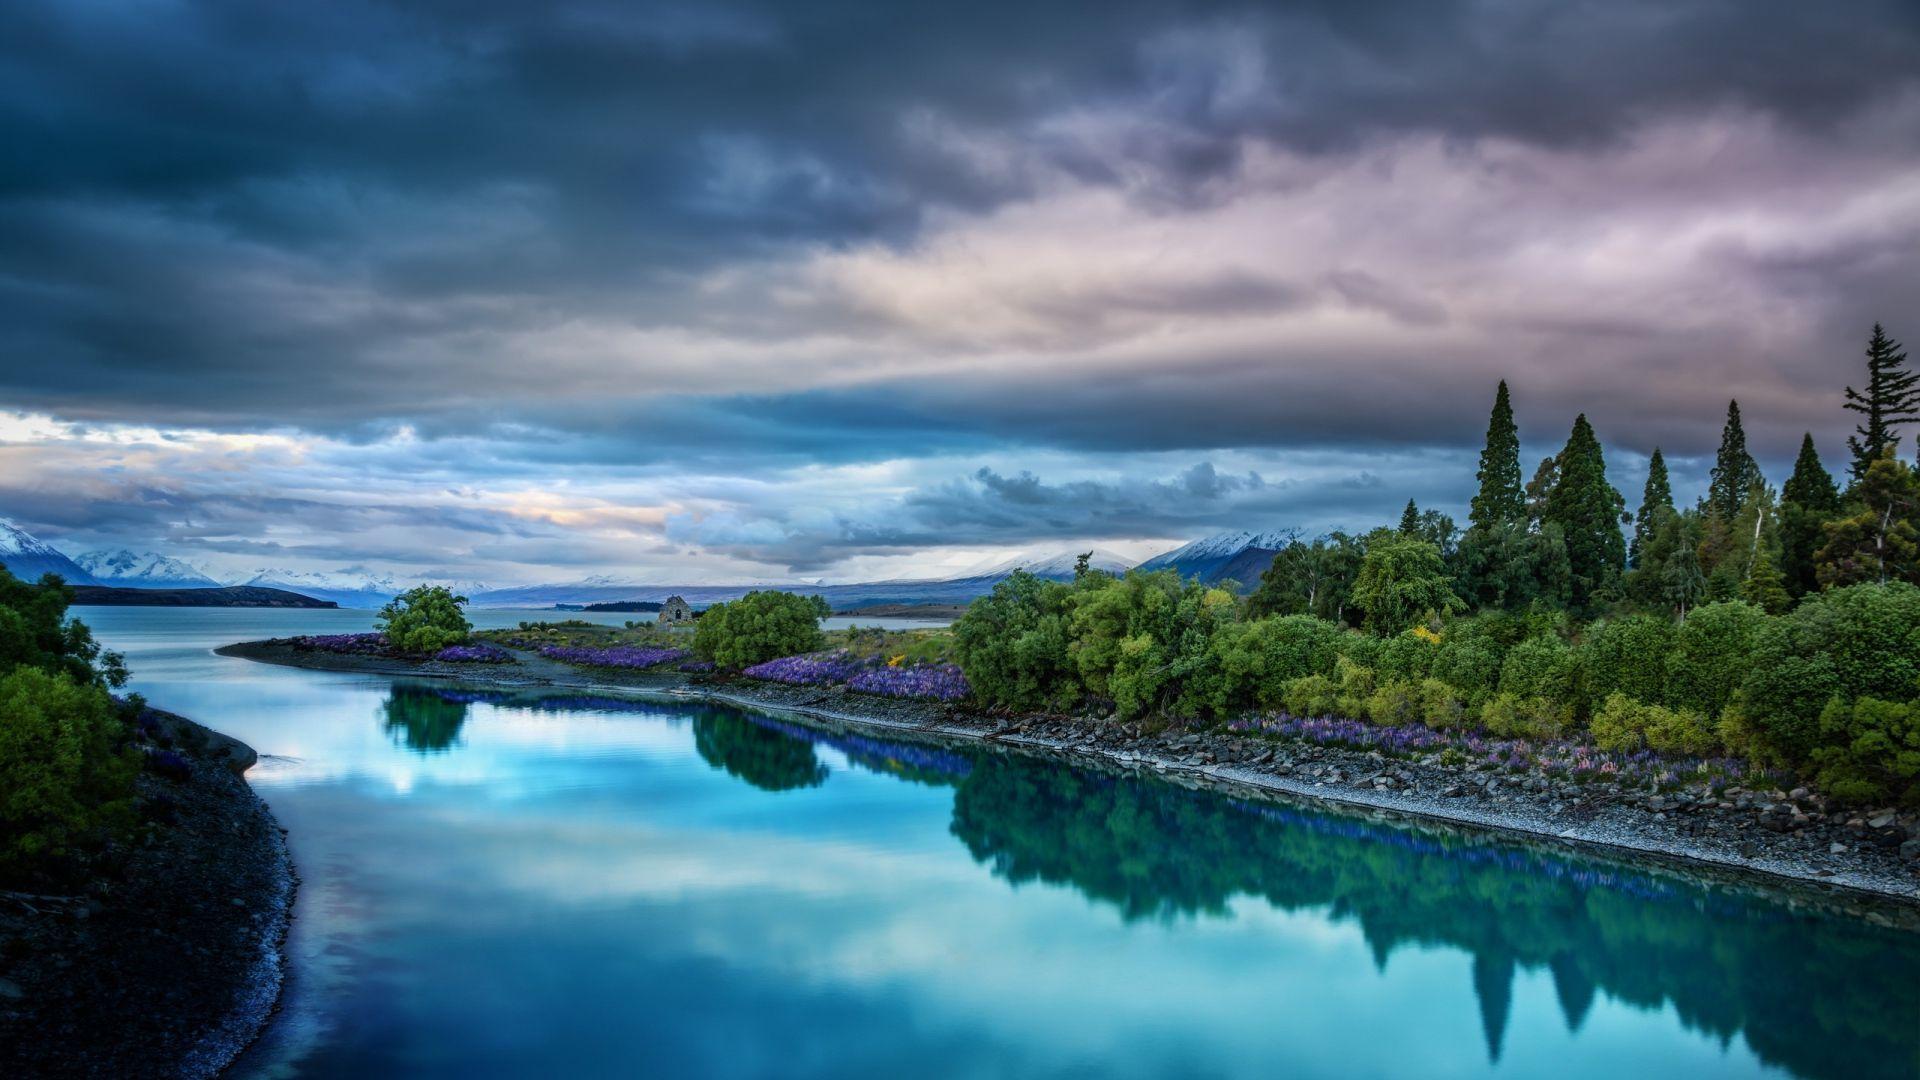 Download Wallpaper sky nature river landscape Full HD